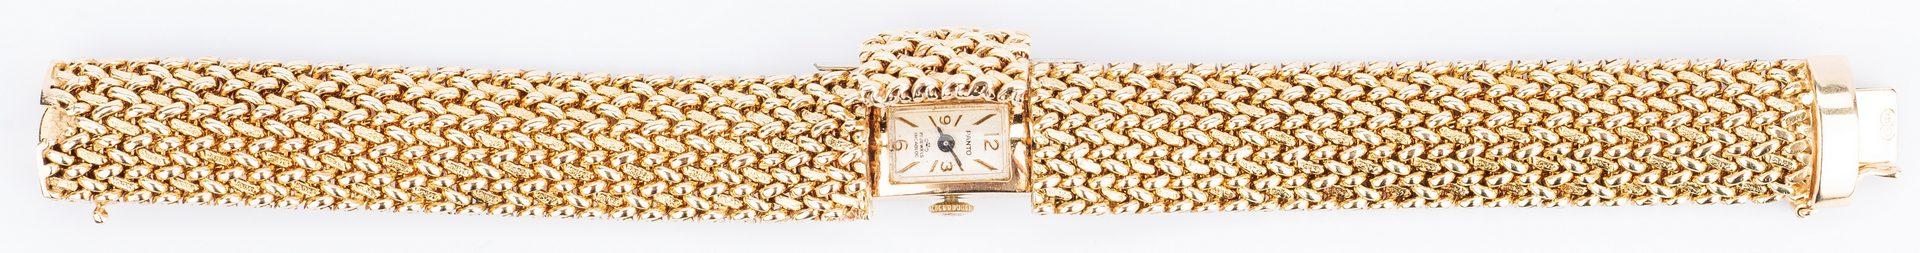 Lot 198: Ladies 14K Swiss Panto Bracelet Watch